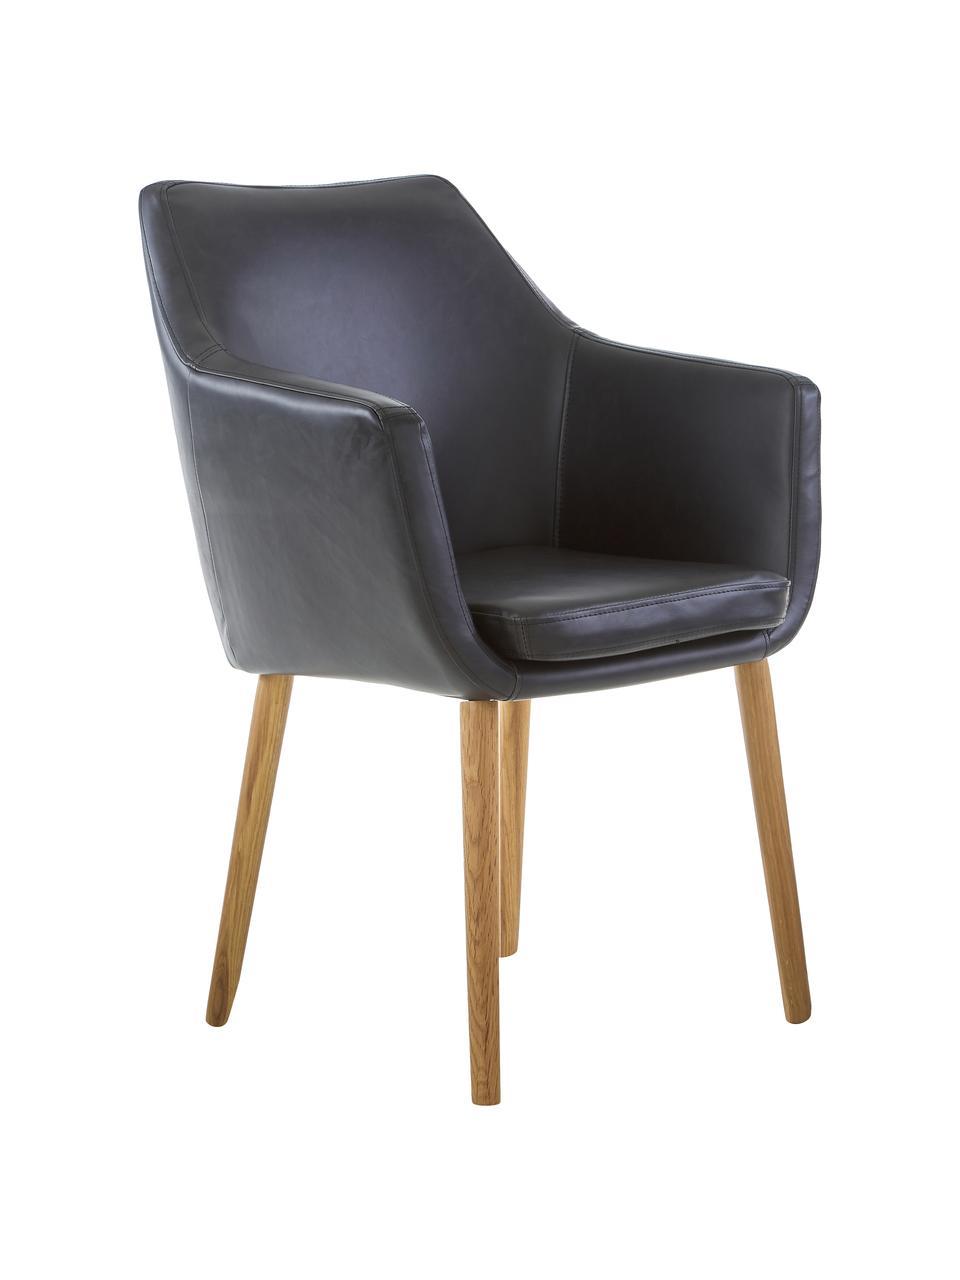 Chaise cuir synthétique Nora, Cuir synthétique noir, pieds chêne